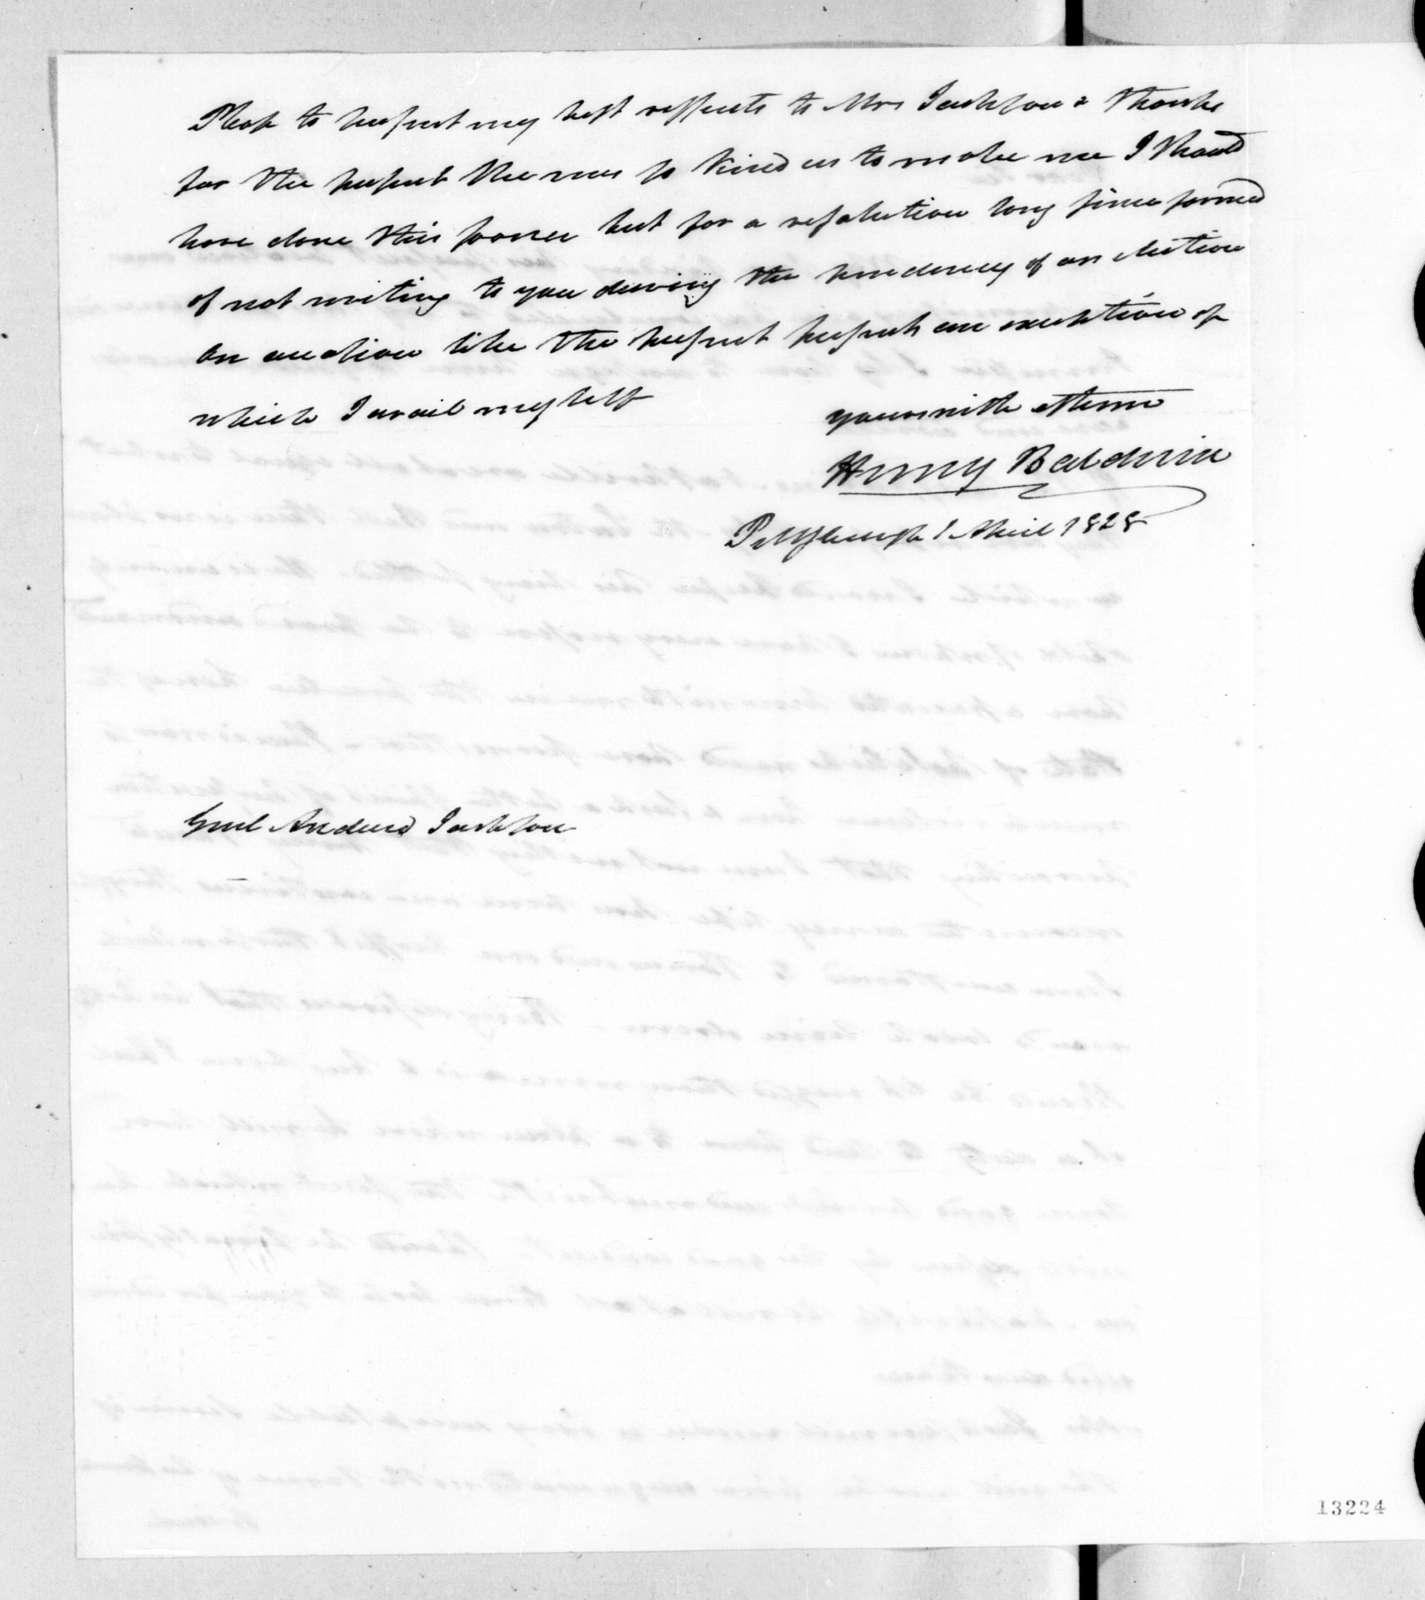 Henry Baldwin to Andrew Jackson, April 1, 1828